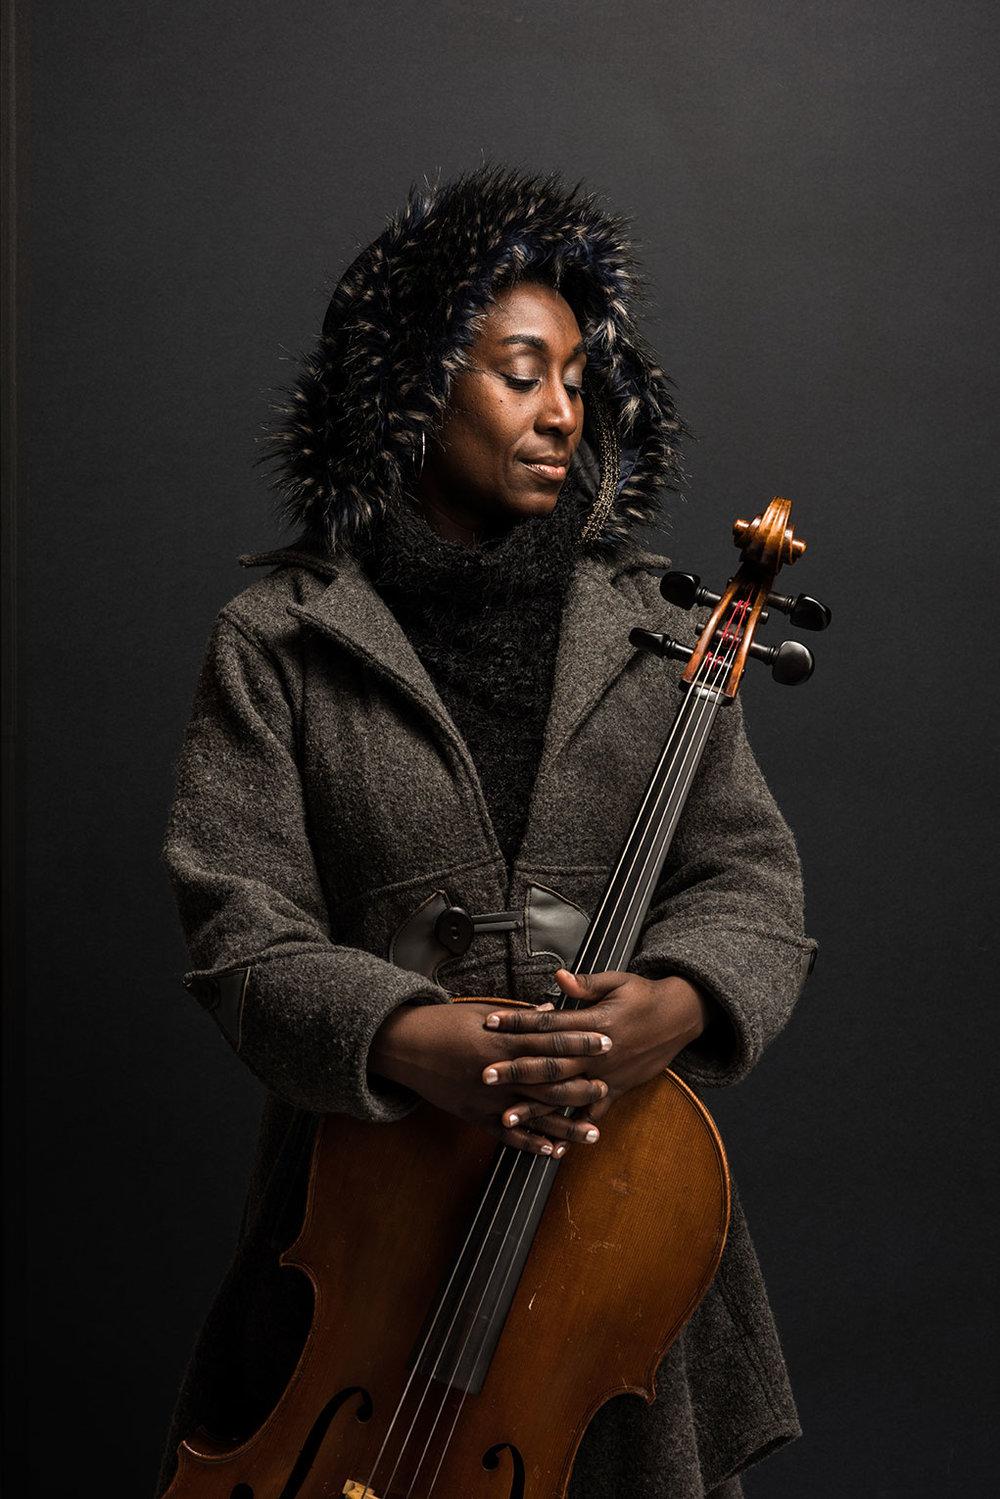 Marshunda Smith, cello teacher and performer